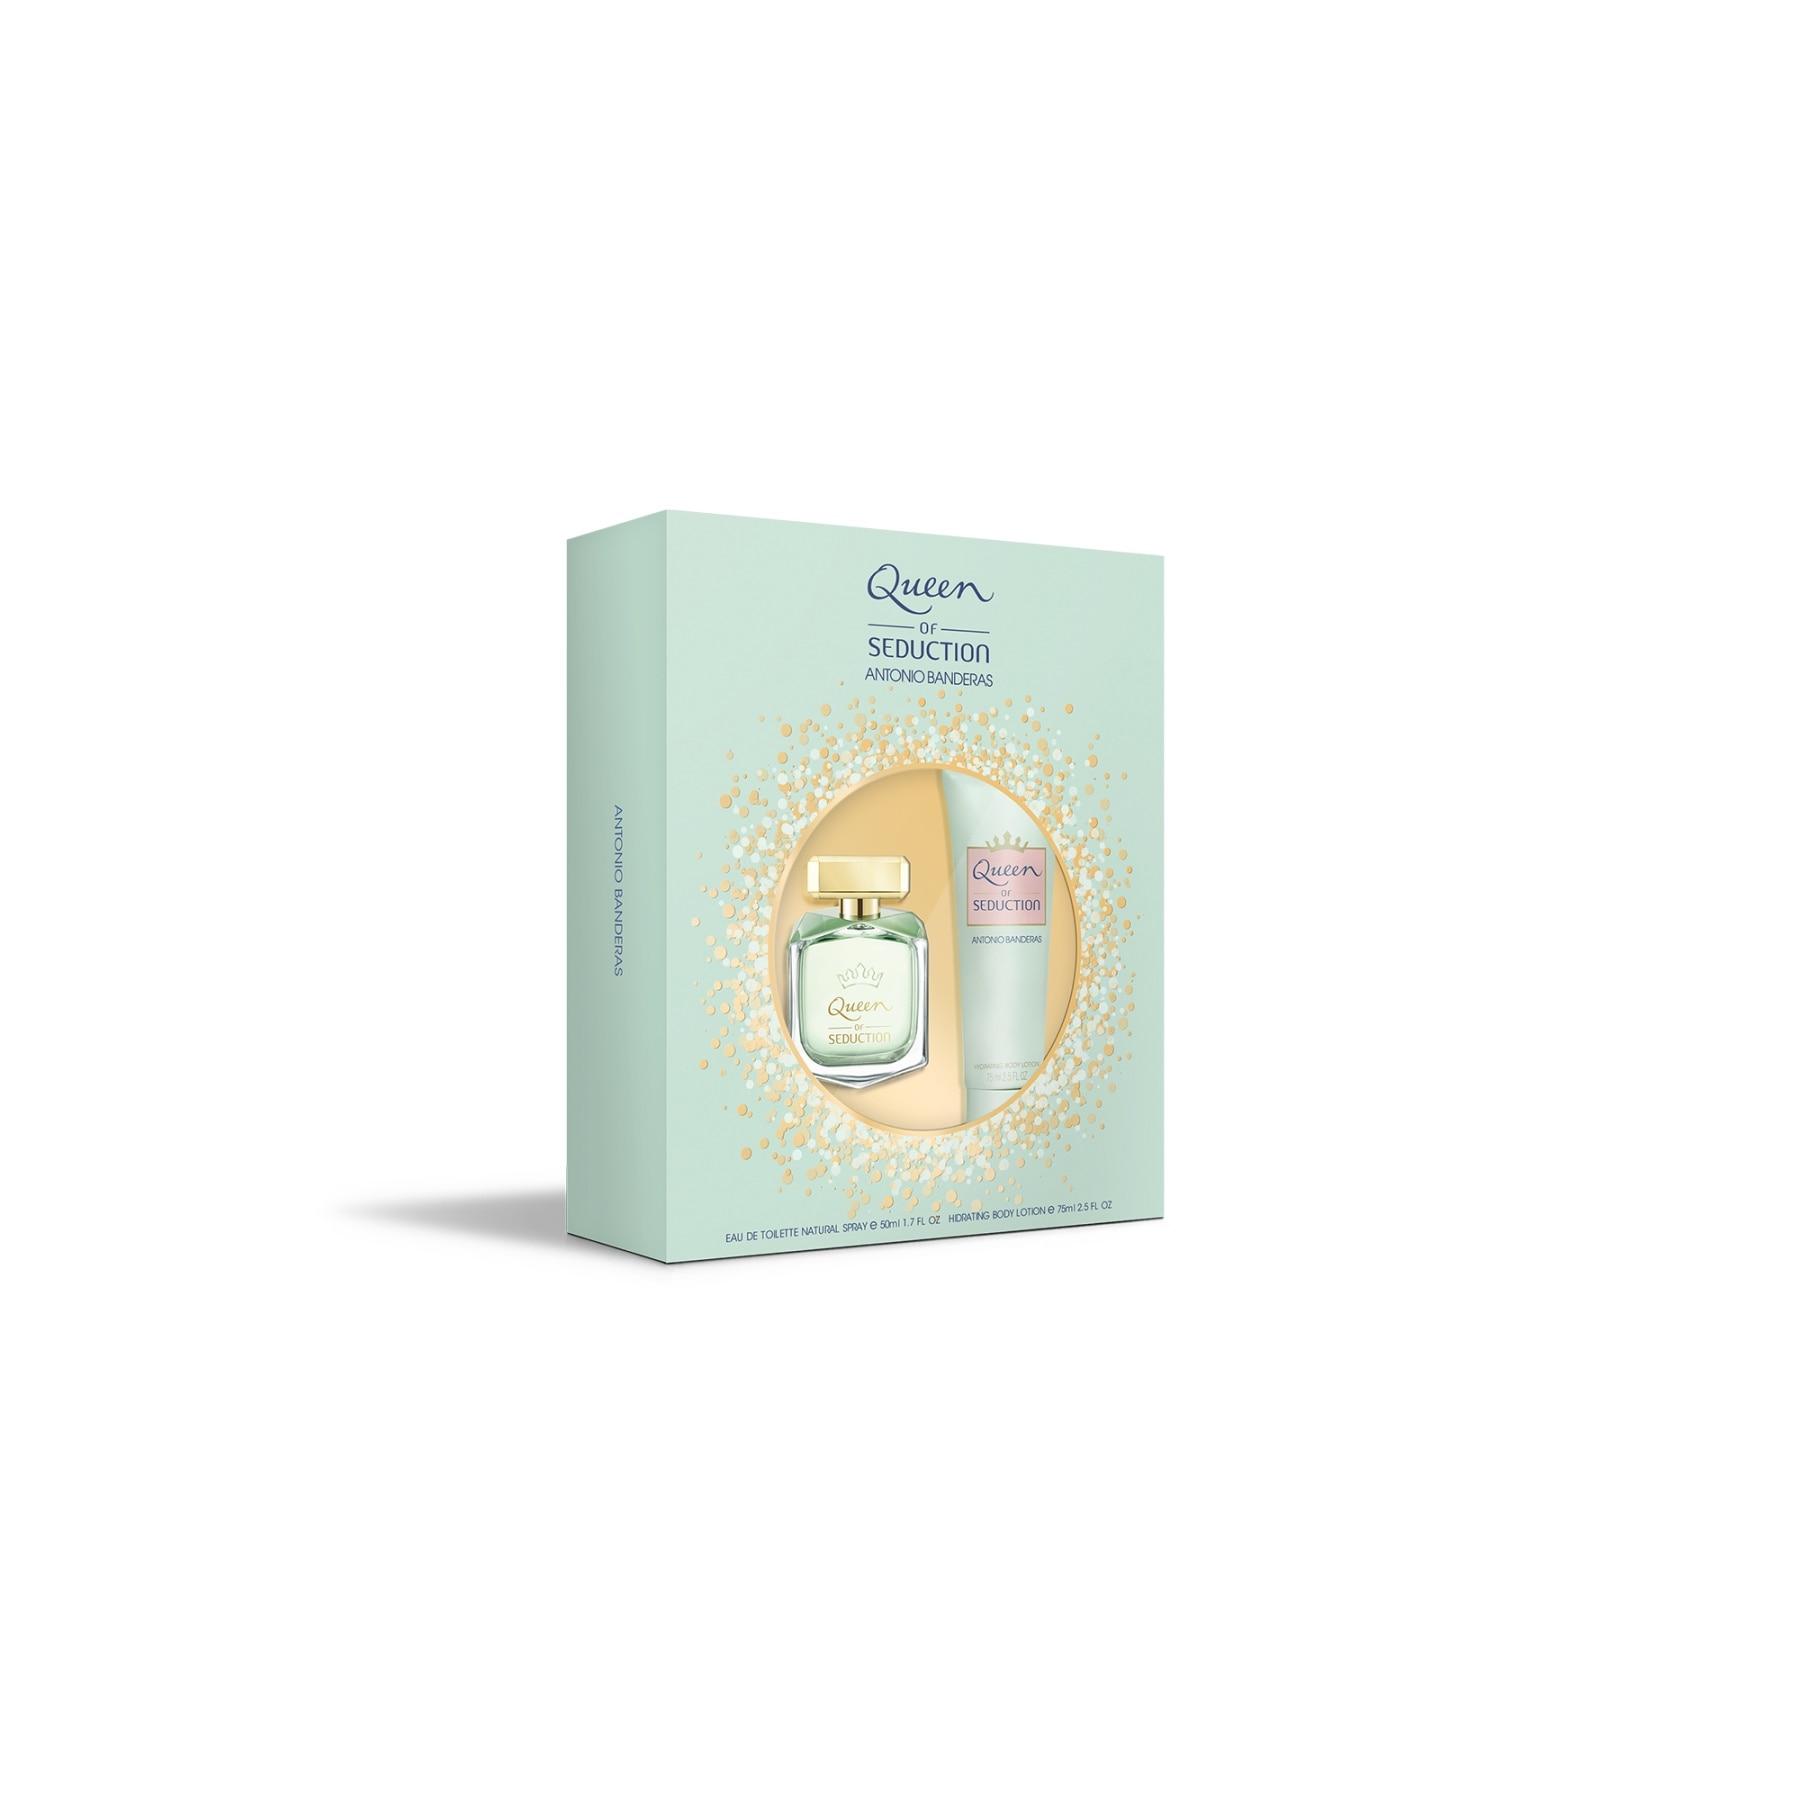 Perfume Antonio Banderas Queen Of Seduction W Set Eau De Toilette Perfume 50 Ml + Body Lotion 75 Ml